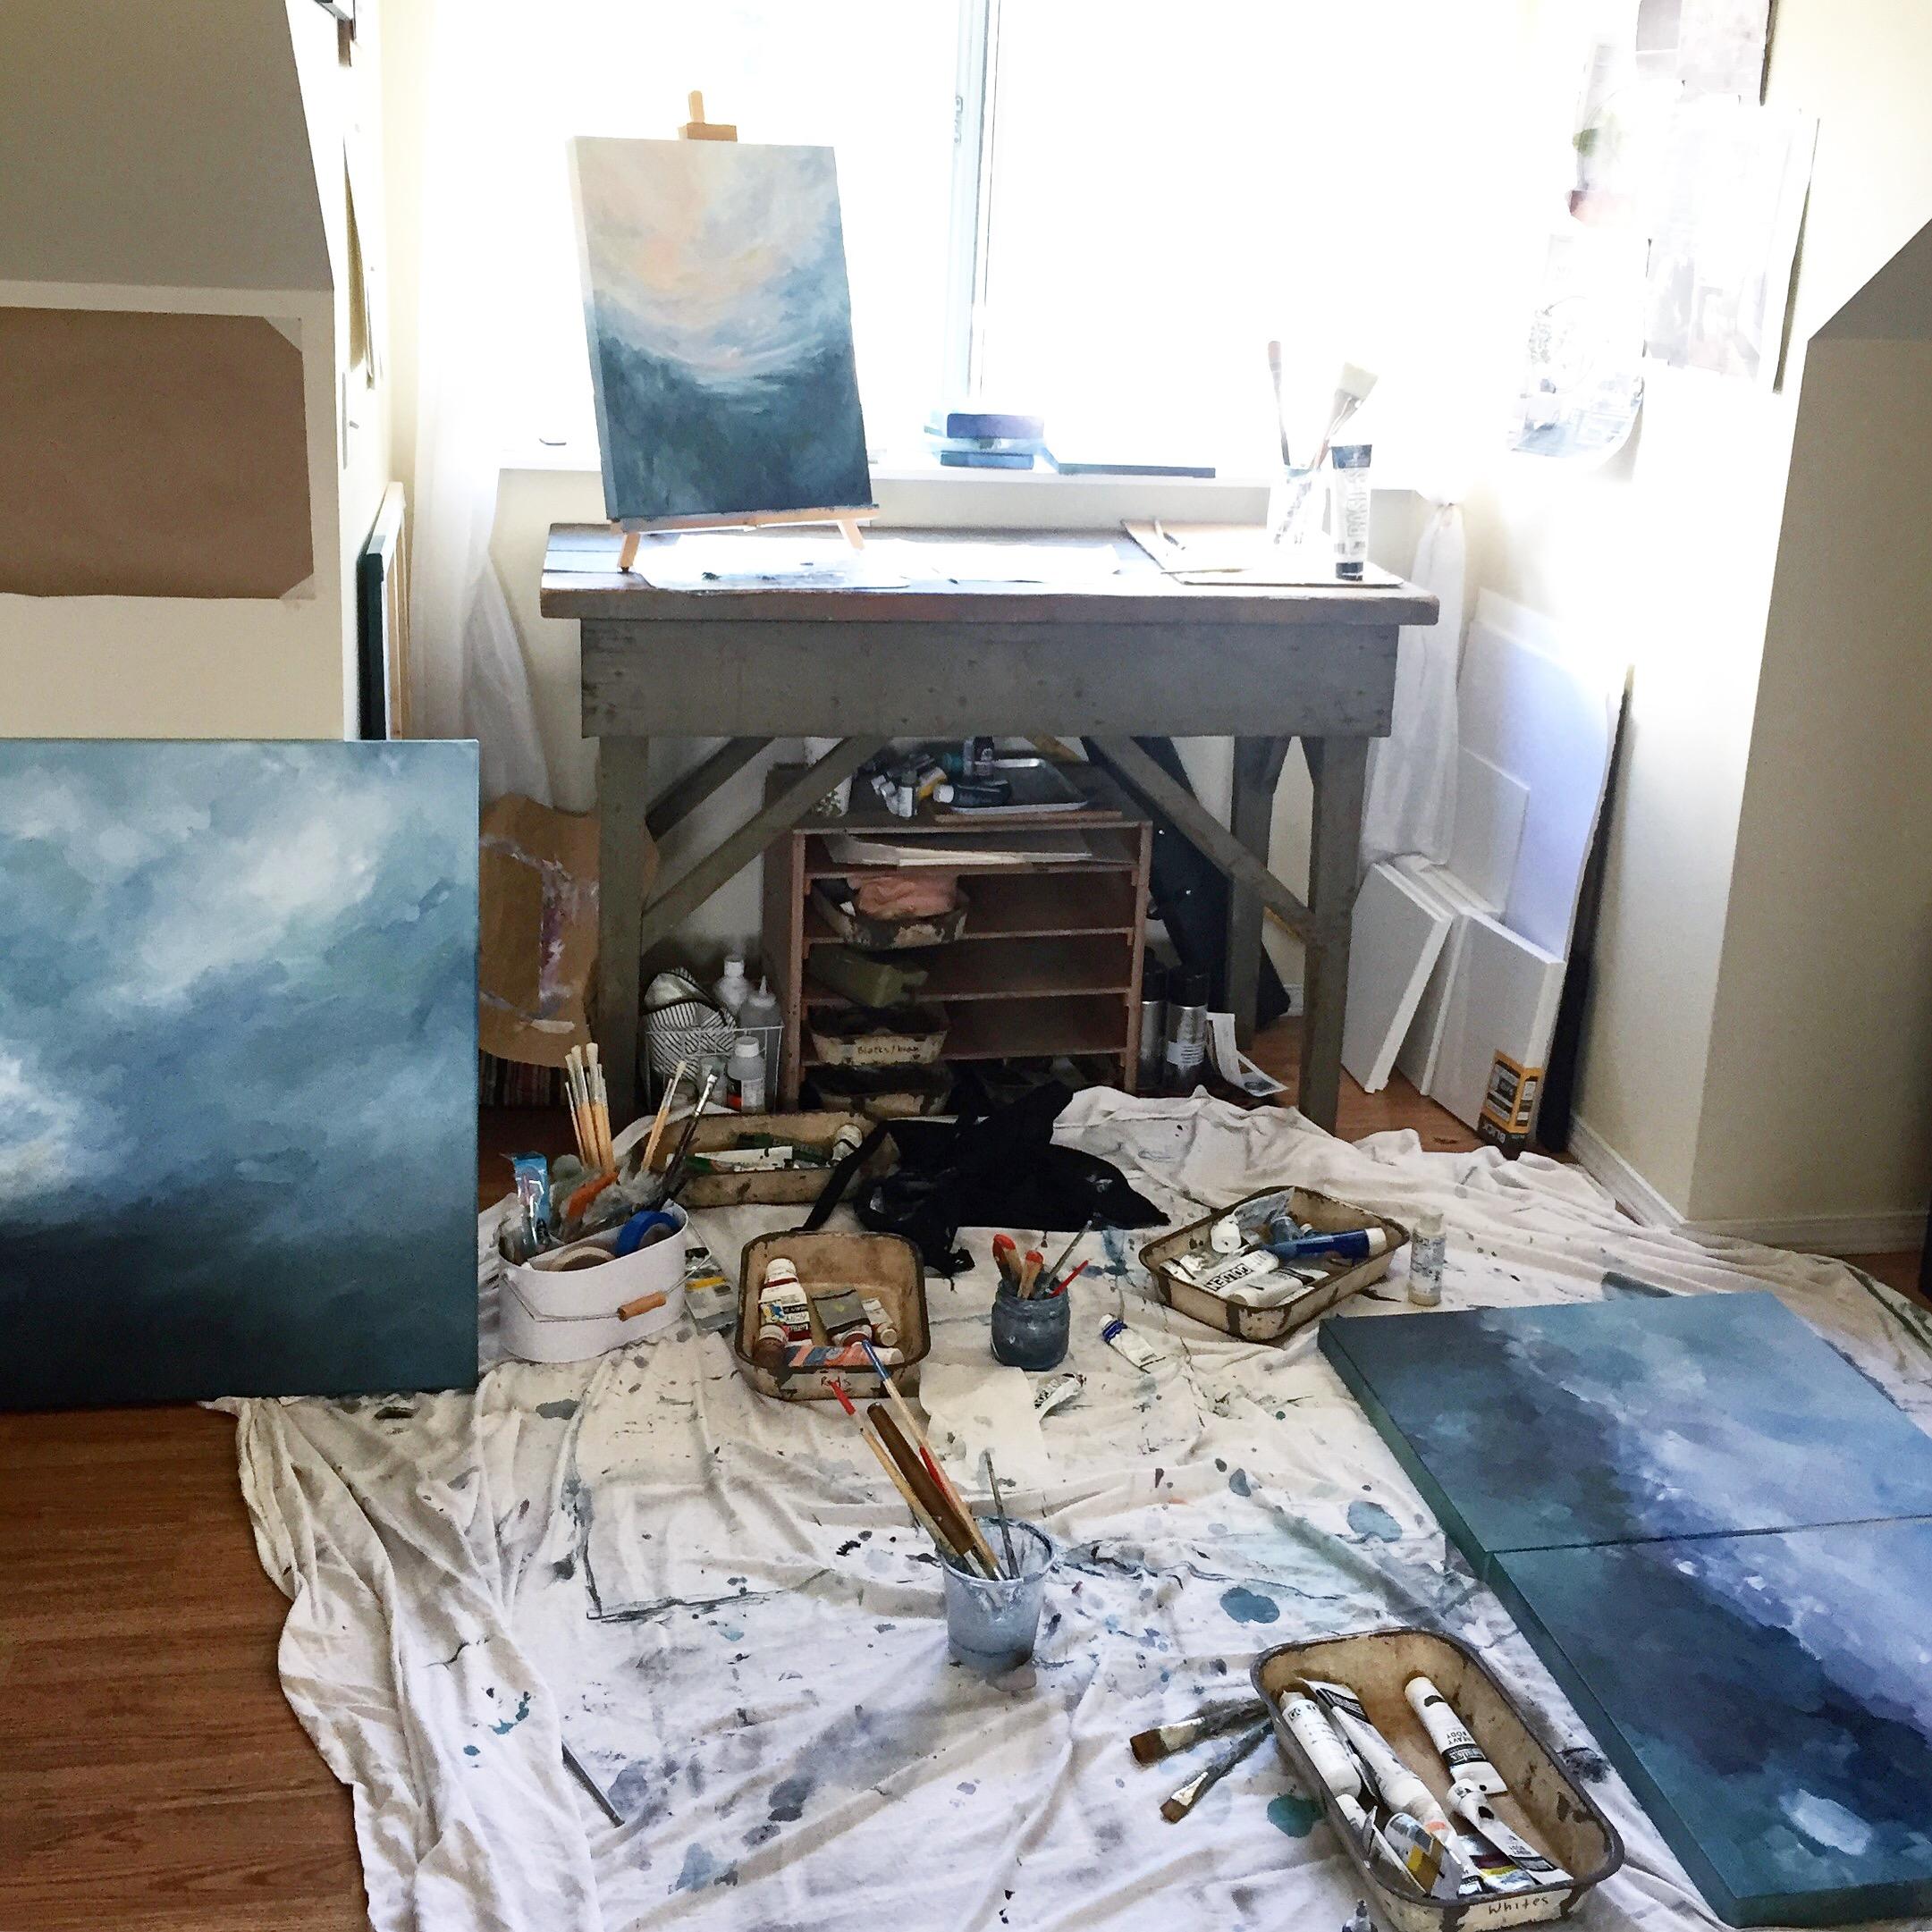 Creating Art in Small Spaces - Kendra Castillo